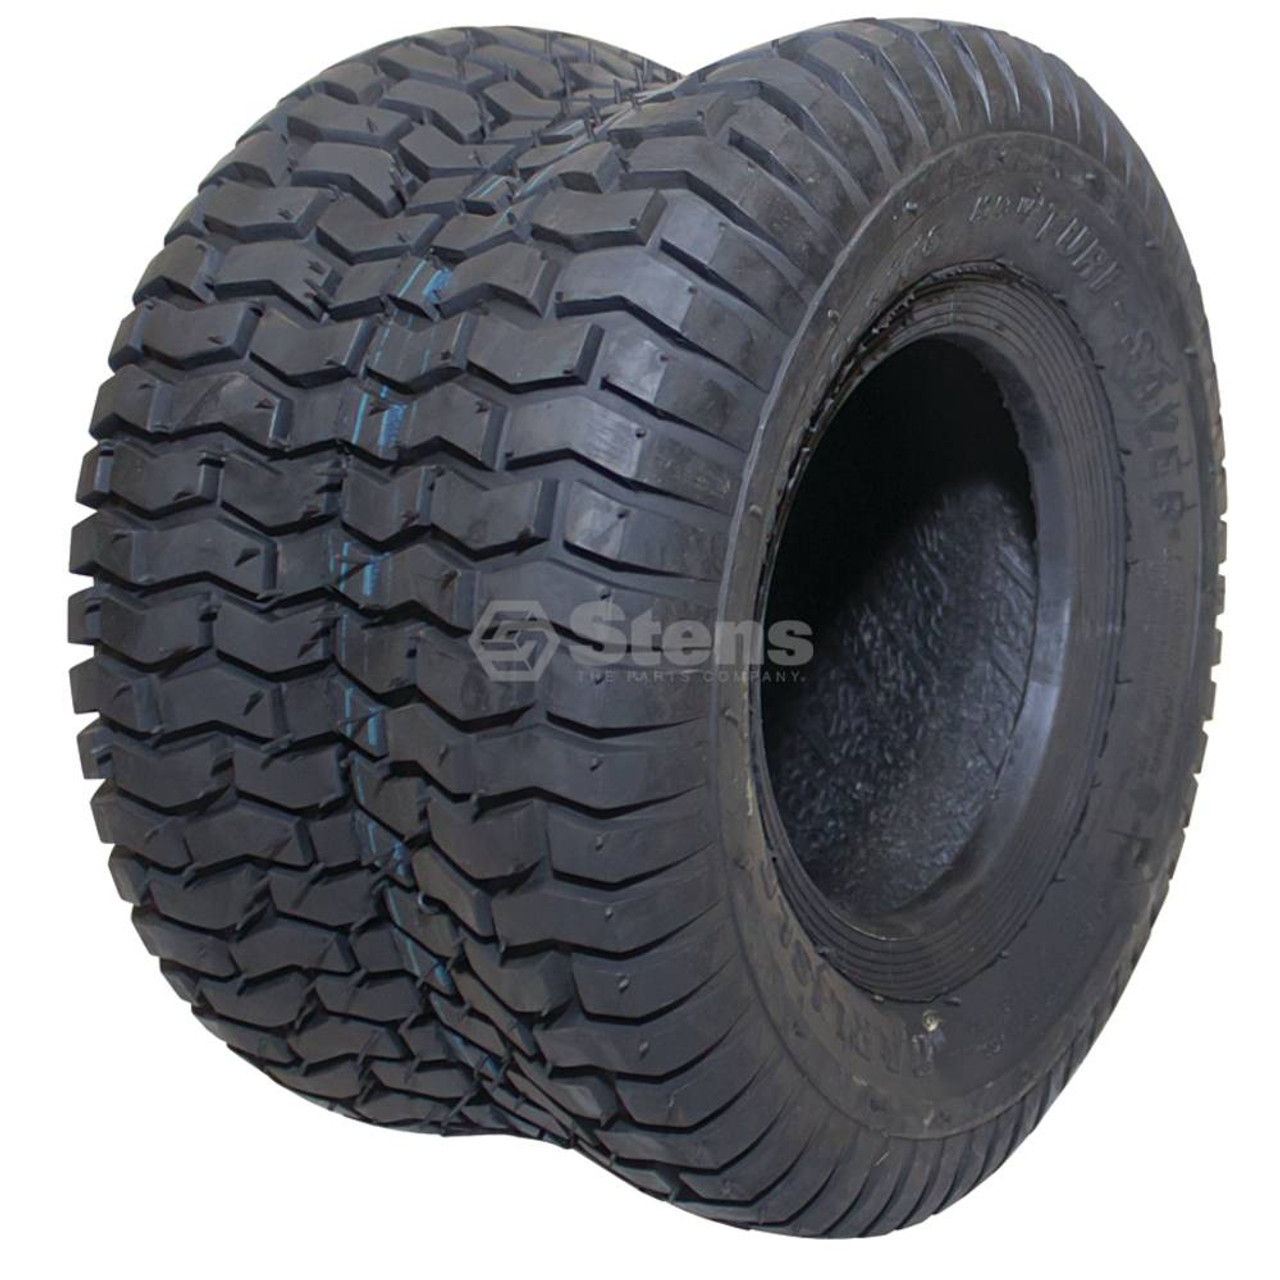 Tire / 13x6.50-6 Turf Saver 2 Ply